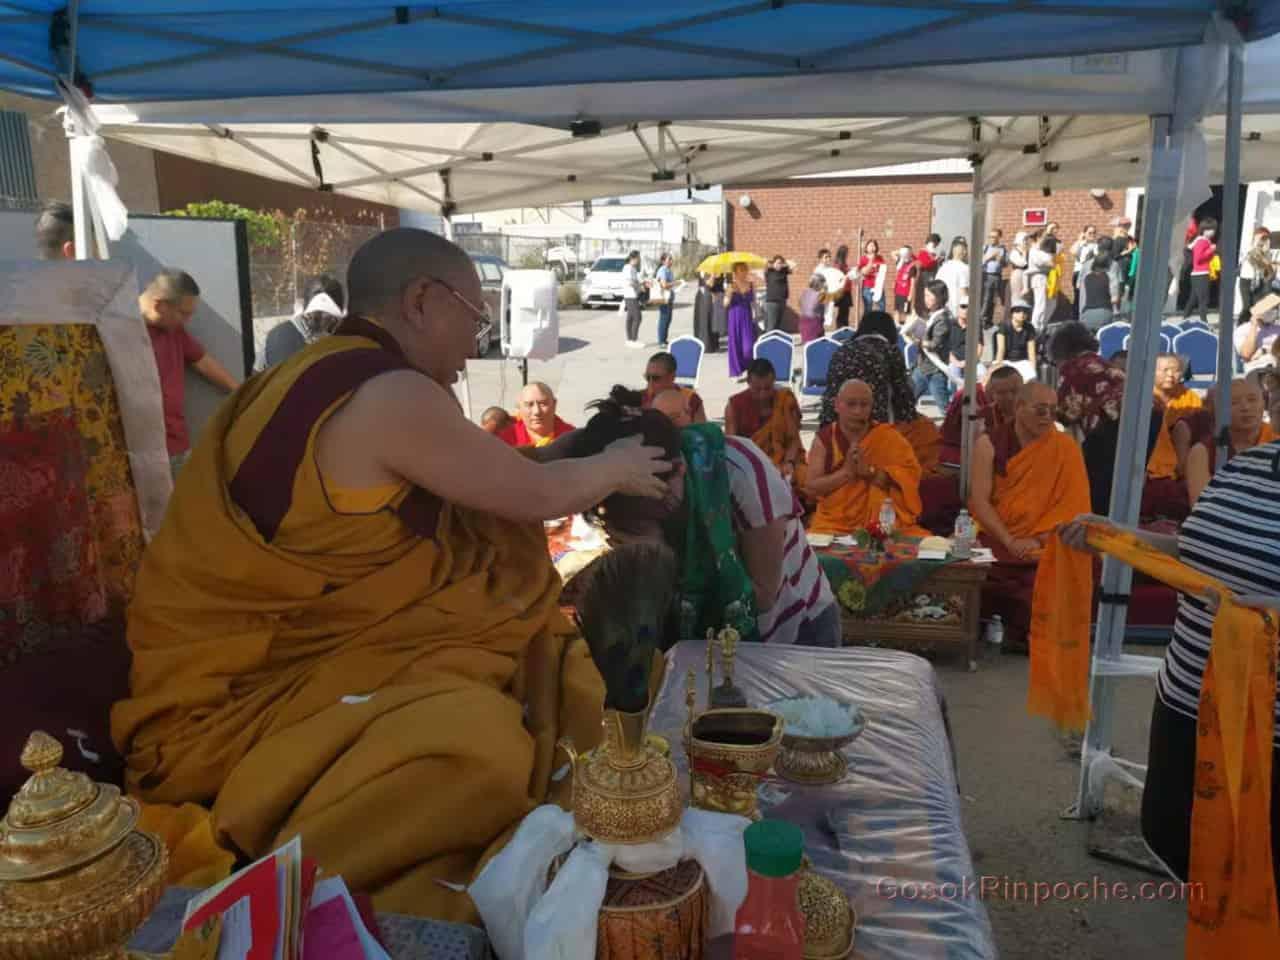 Gosok Rinpoche fire puja 20190923122624